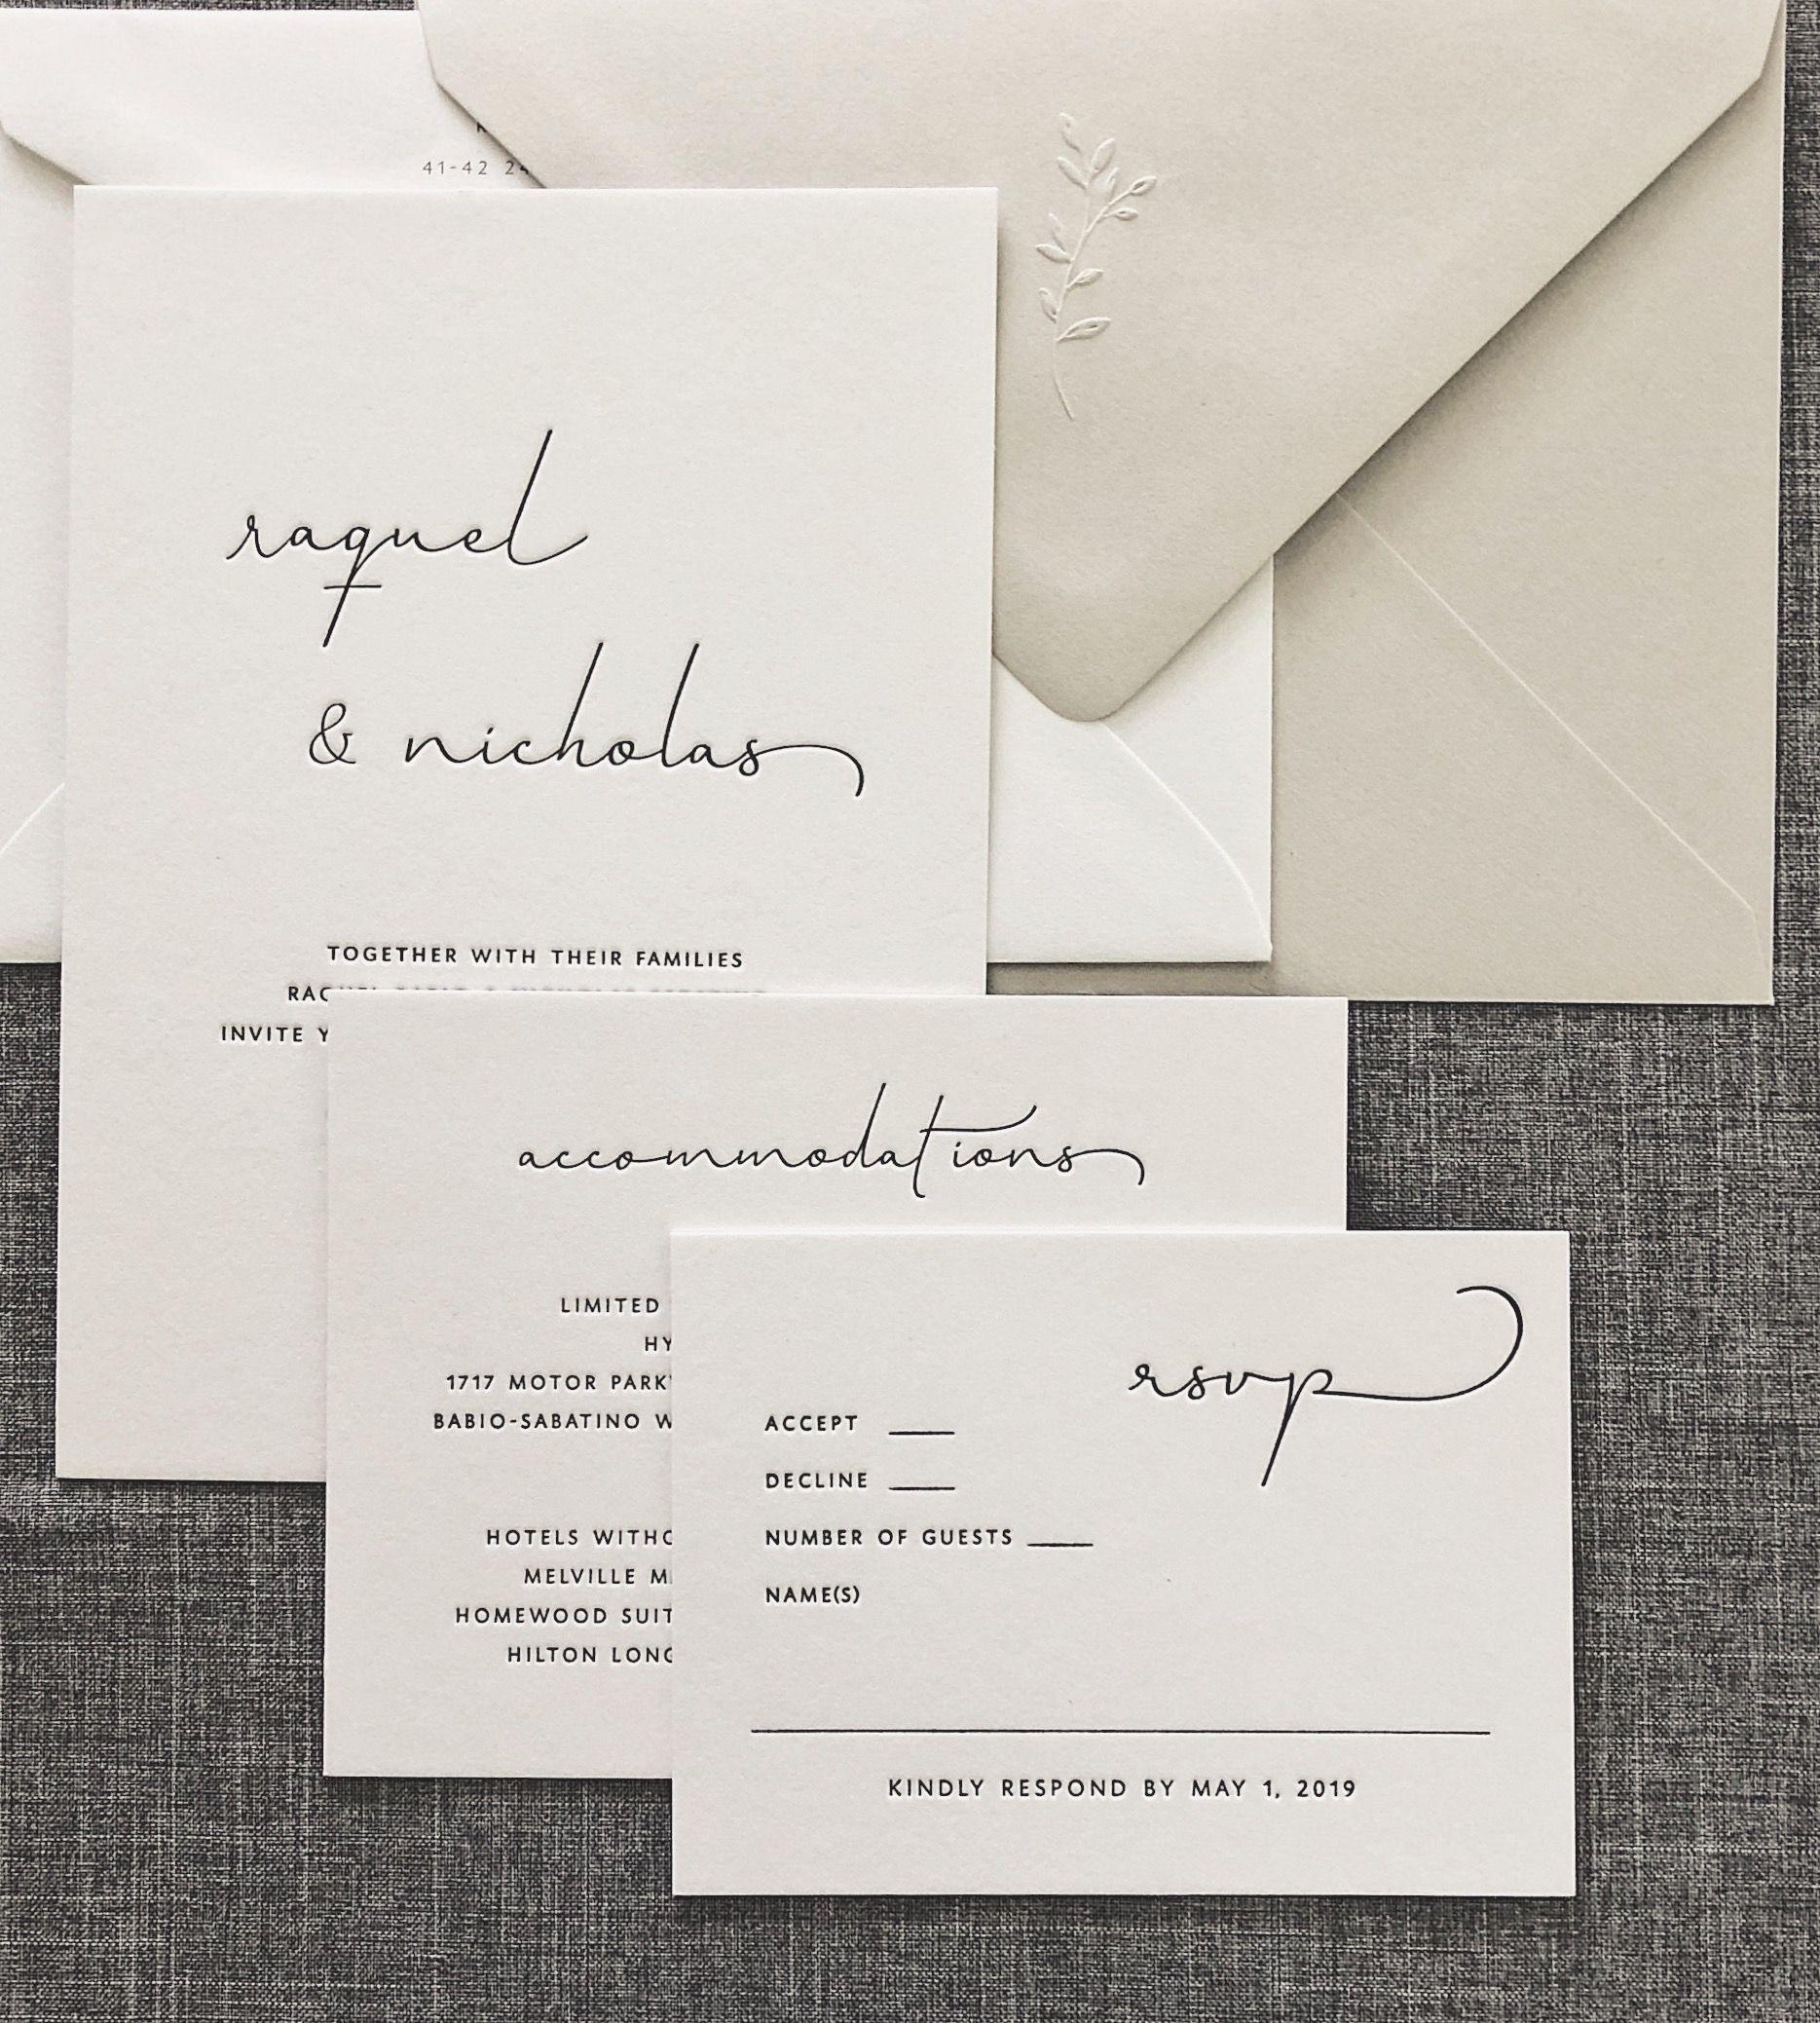 Handmade Paper Wedding Invitations Letterpress Wedding Invitations Invites Letterpress Wedding Invitations Handmade Wedding Invitations Letterpress Wedding